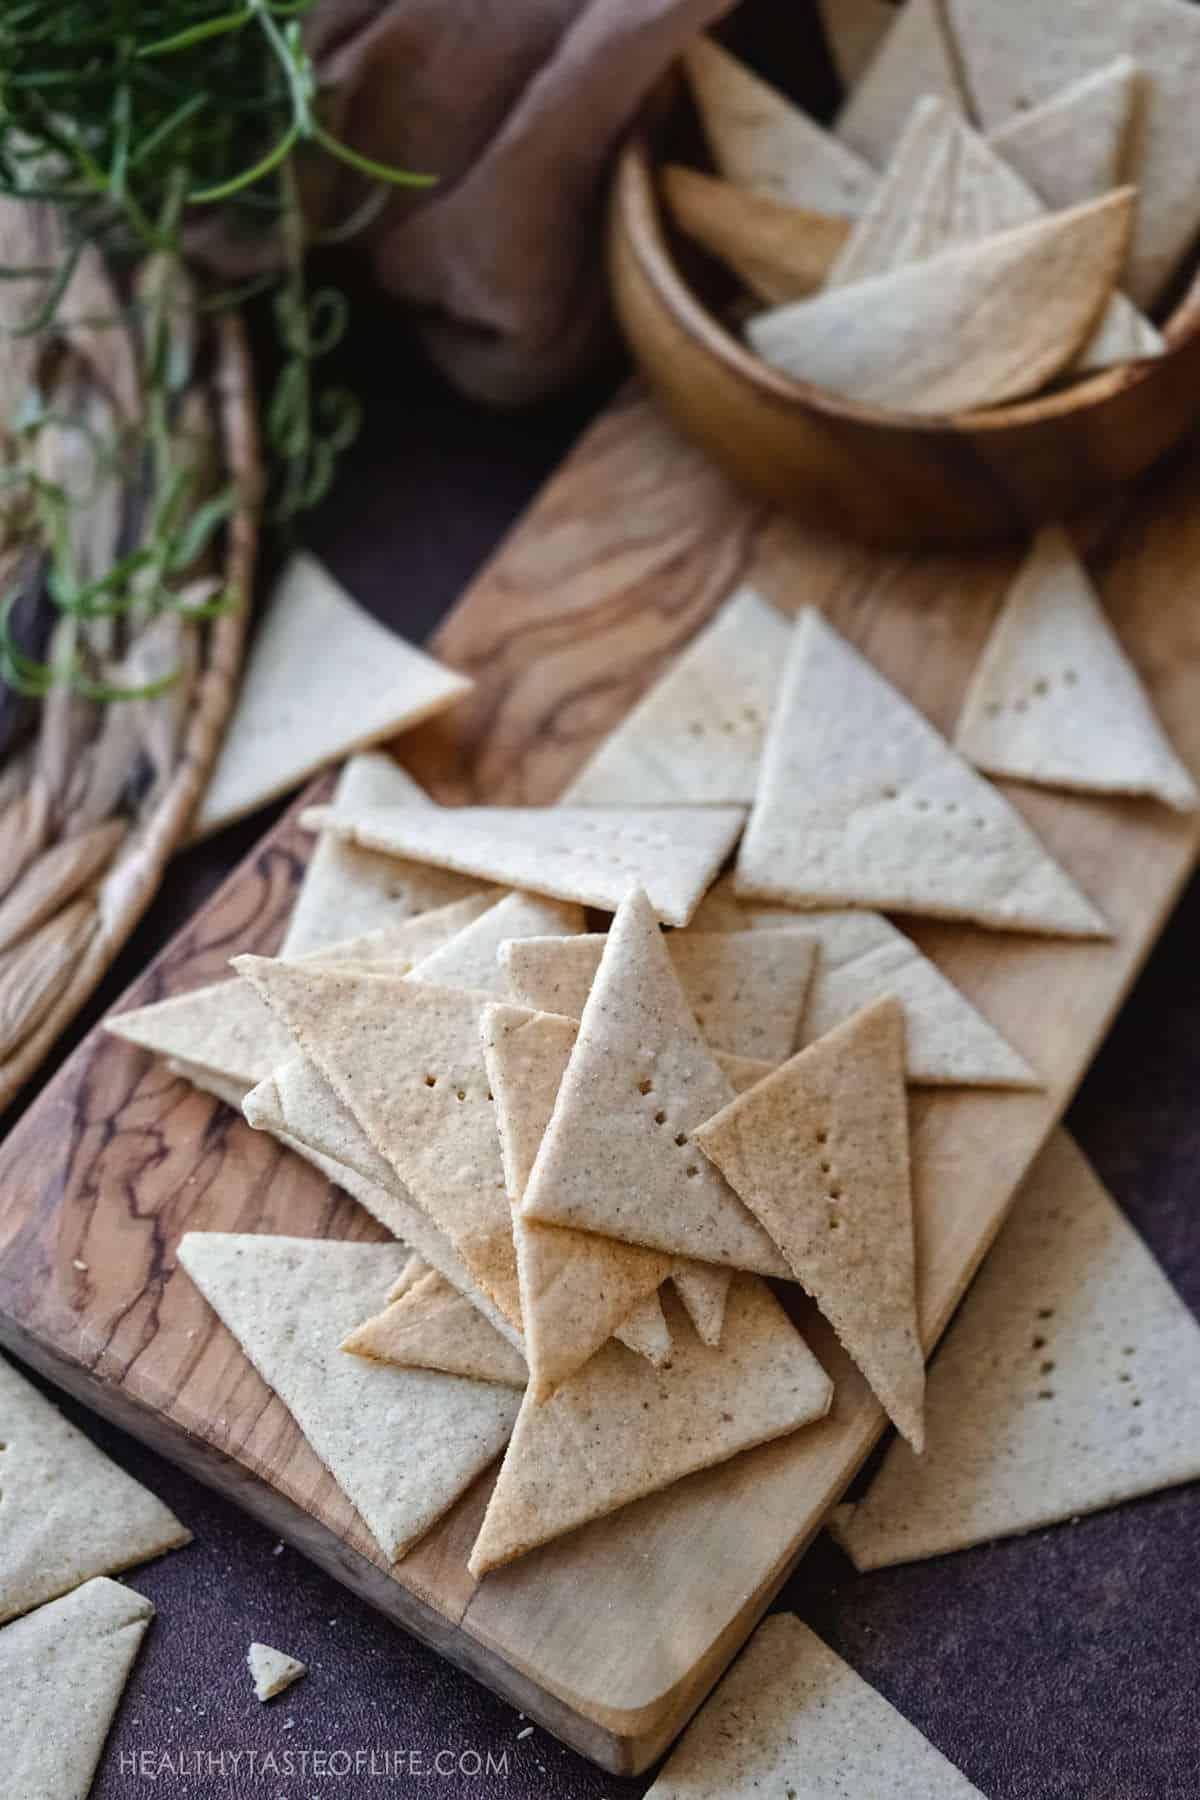 Grain free crackers - gluten free, vegan, paleo, AIP crackers - made with cassava flour, tigernut flour and flax seeds.